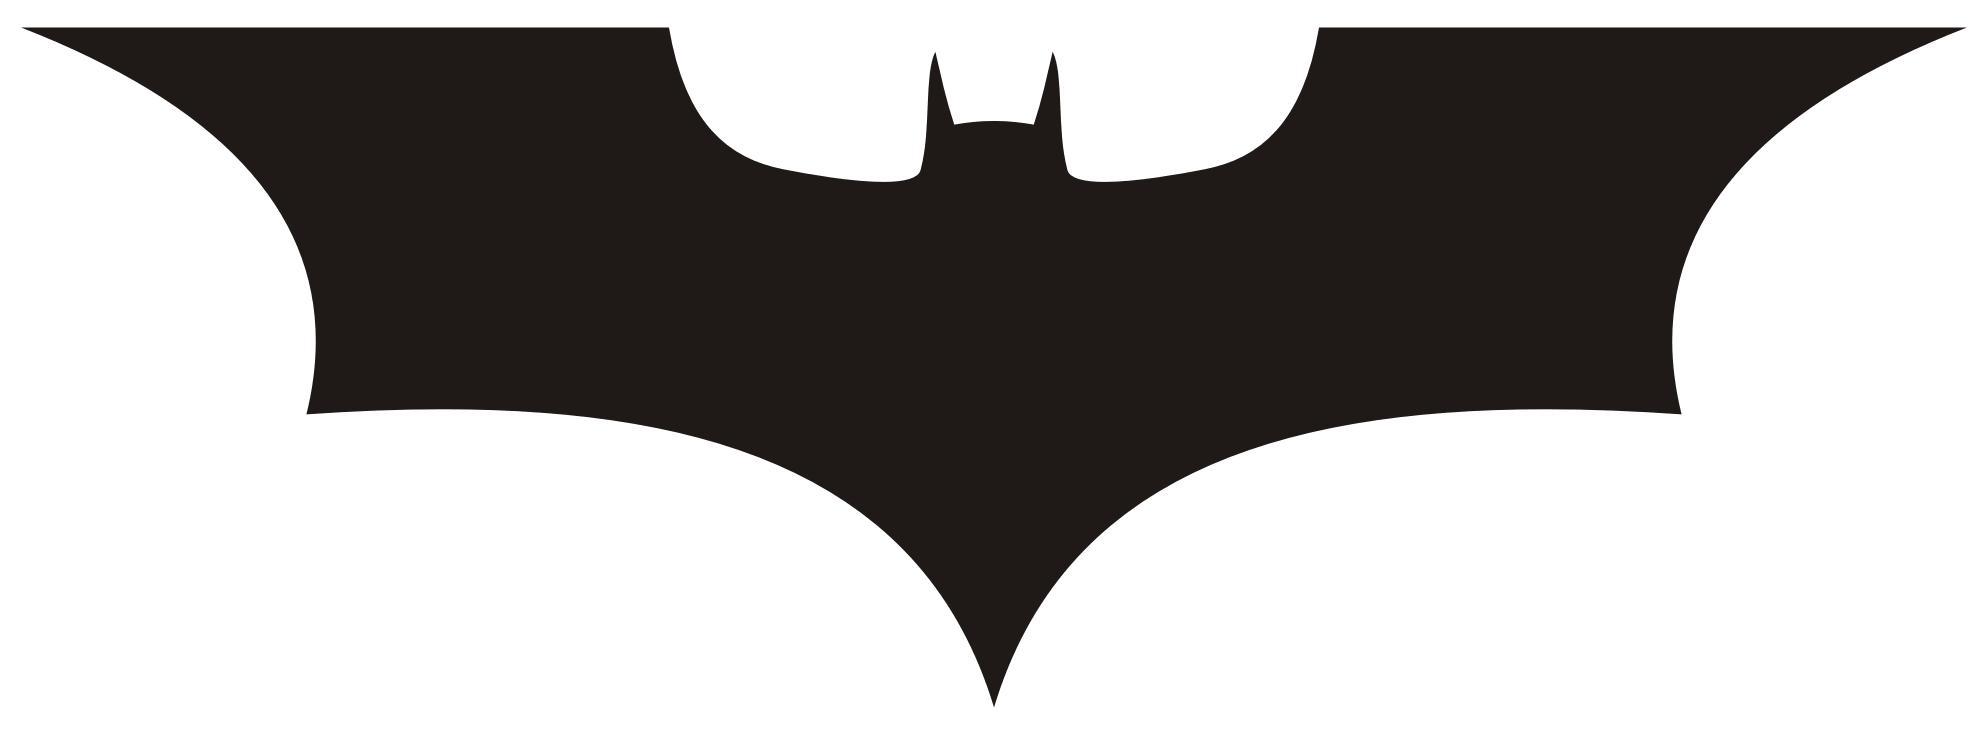 image batman logo 06 jpg headhunter s holosuite wiki fandom